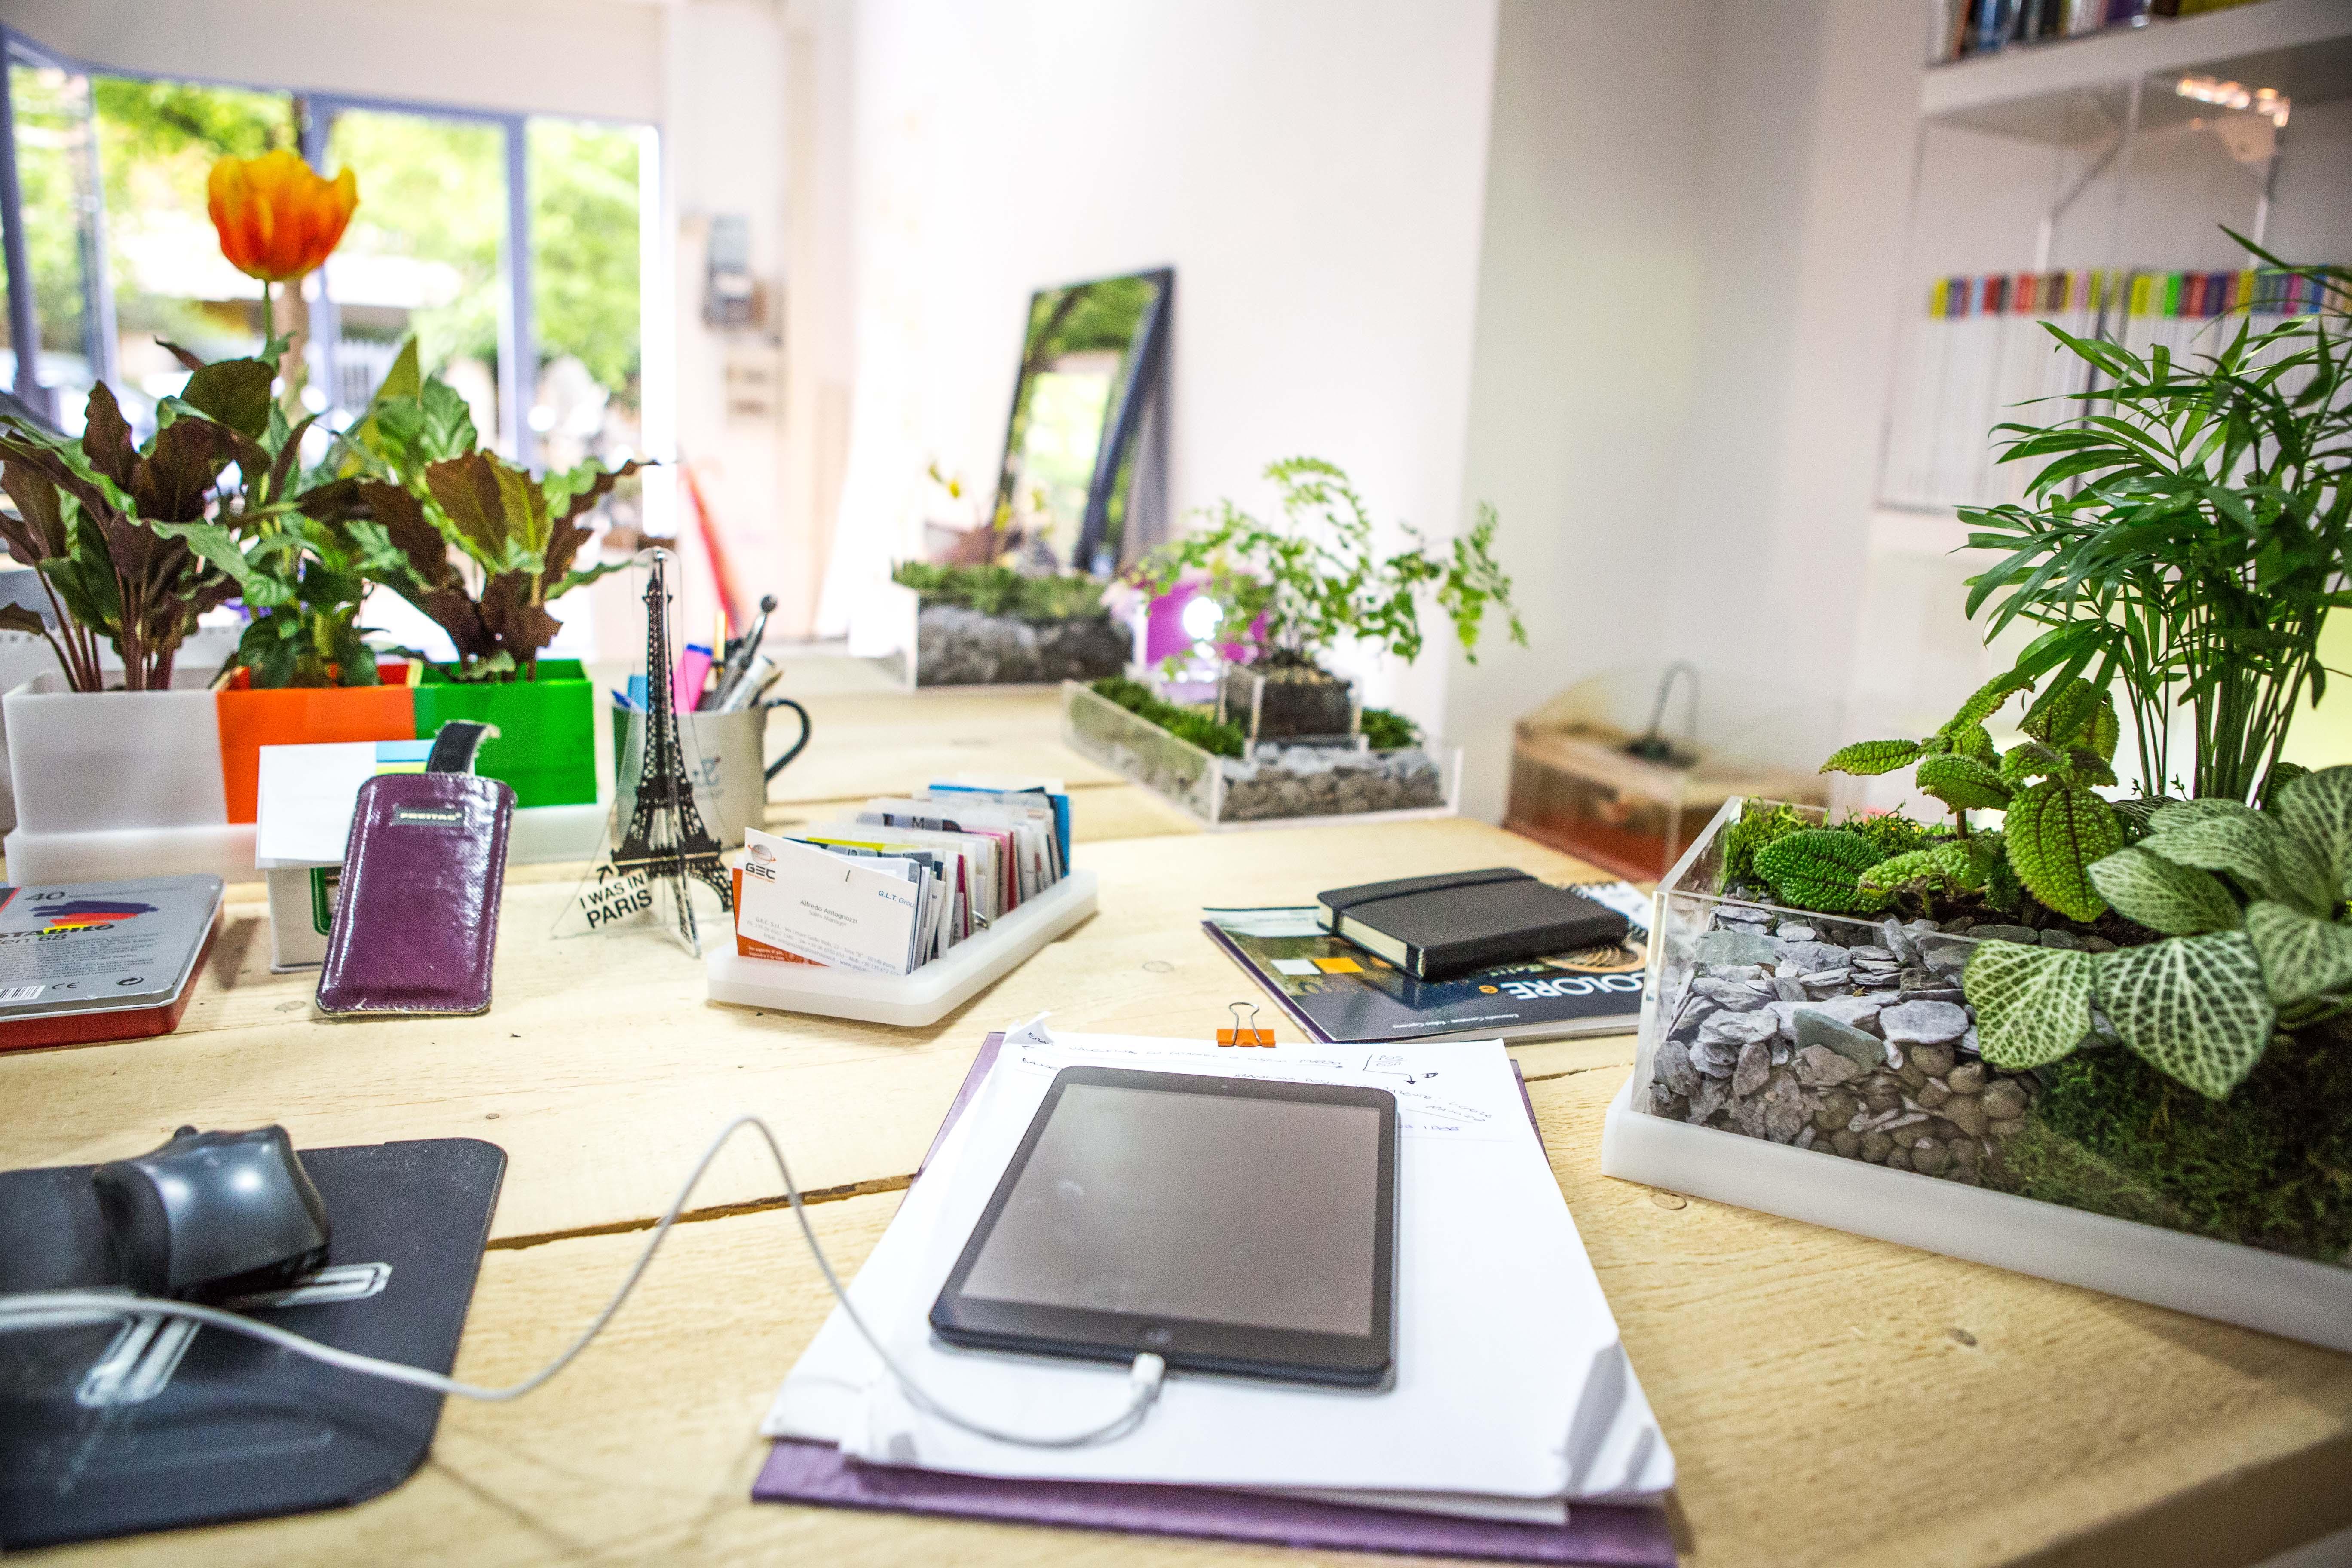 Piante arredamento moderno elegant arredare con le piante for Arredamento outdoor online